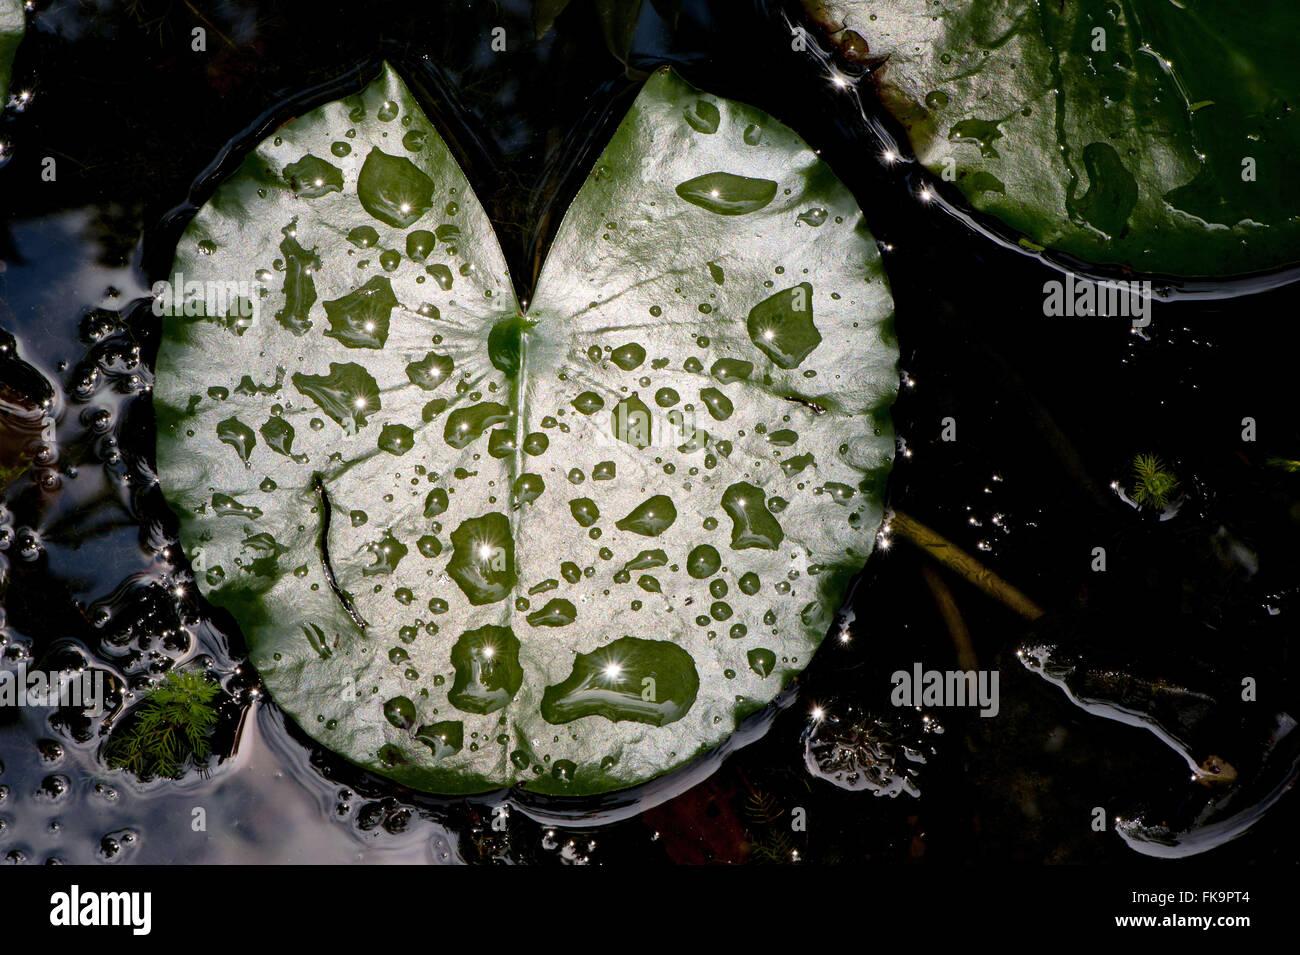 Sheet lily - aquatic plant - Stock Image